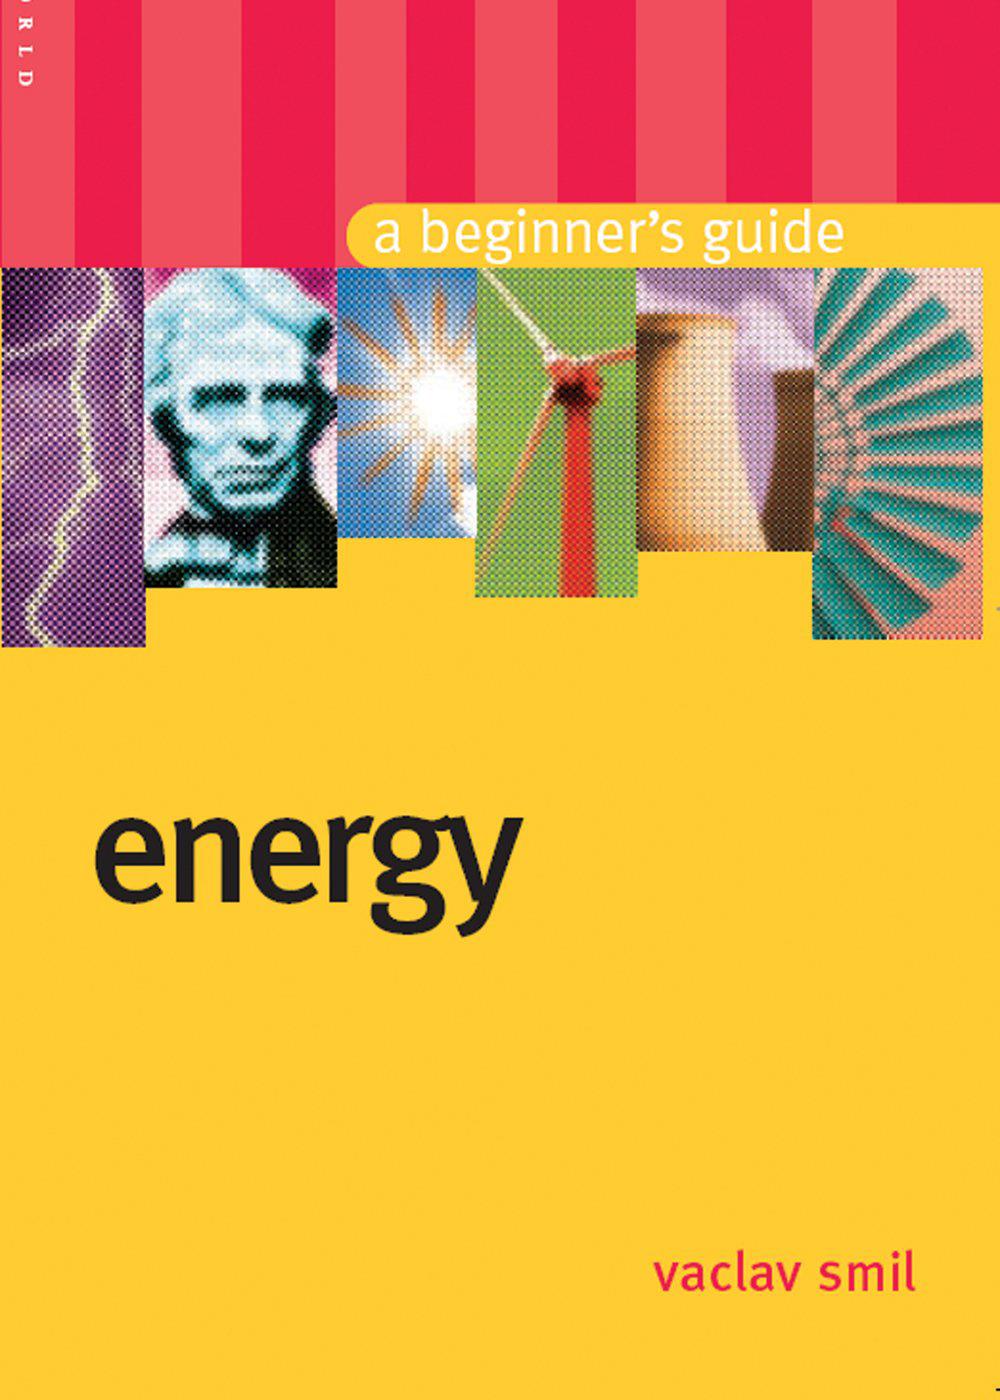 Smil, Vaclac - Energy Beguiners Guide.jpg